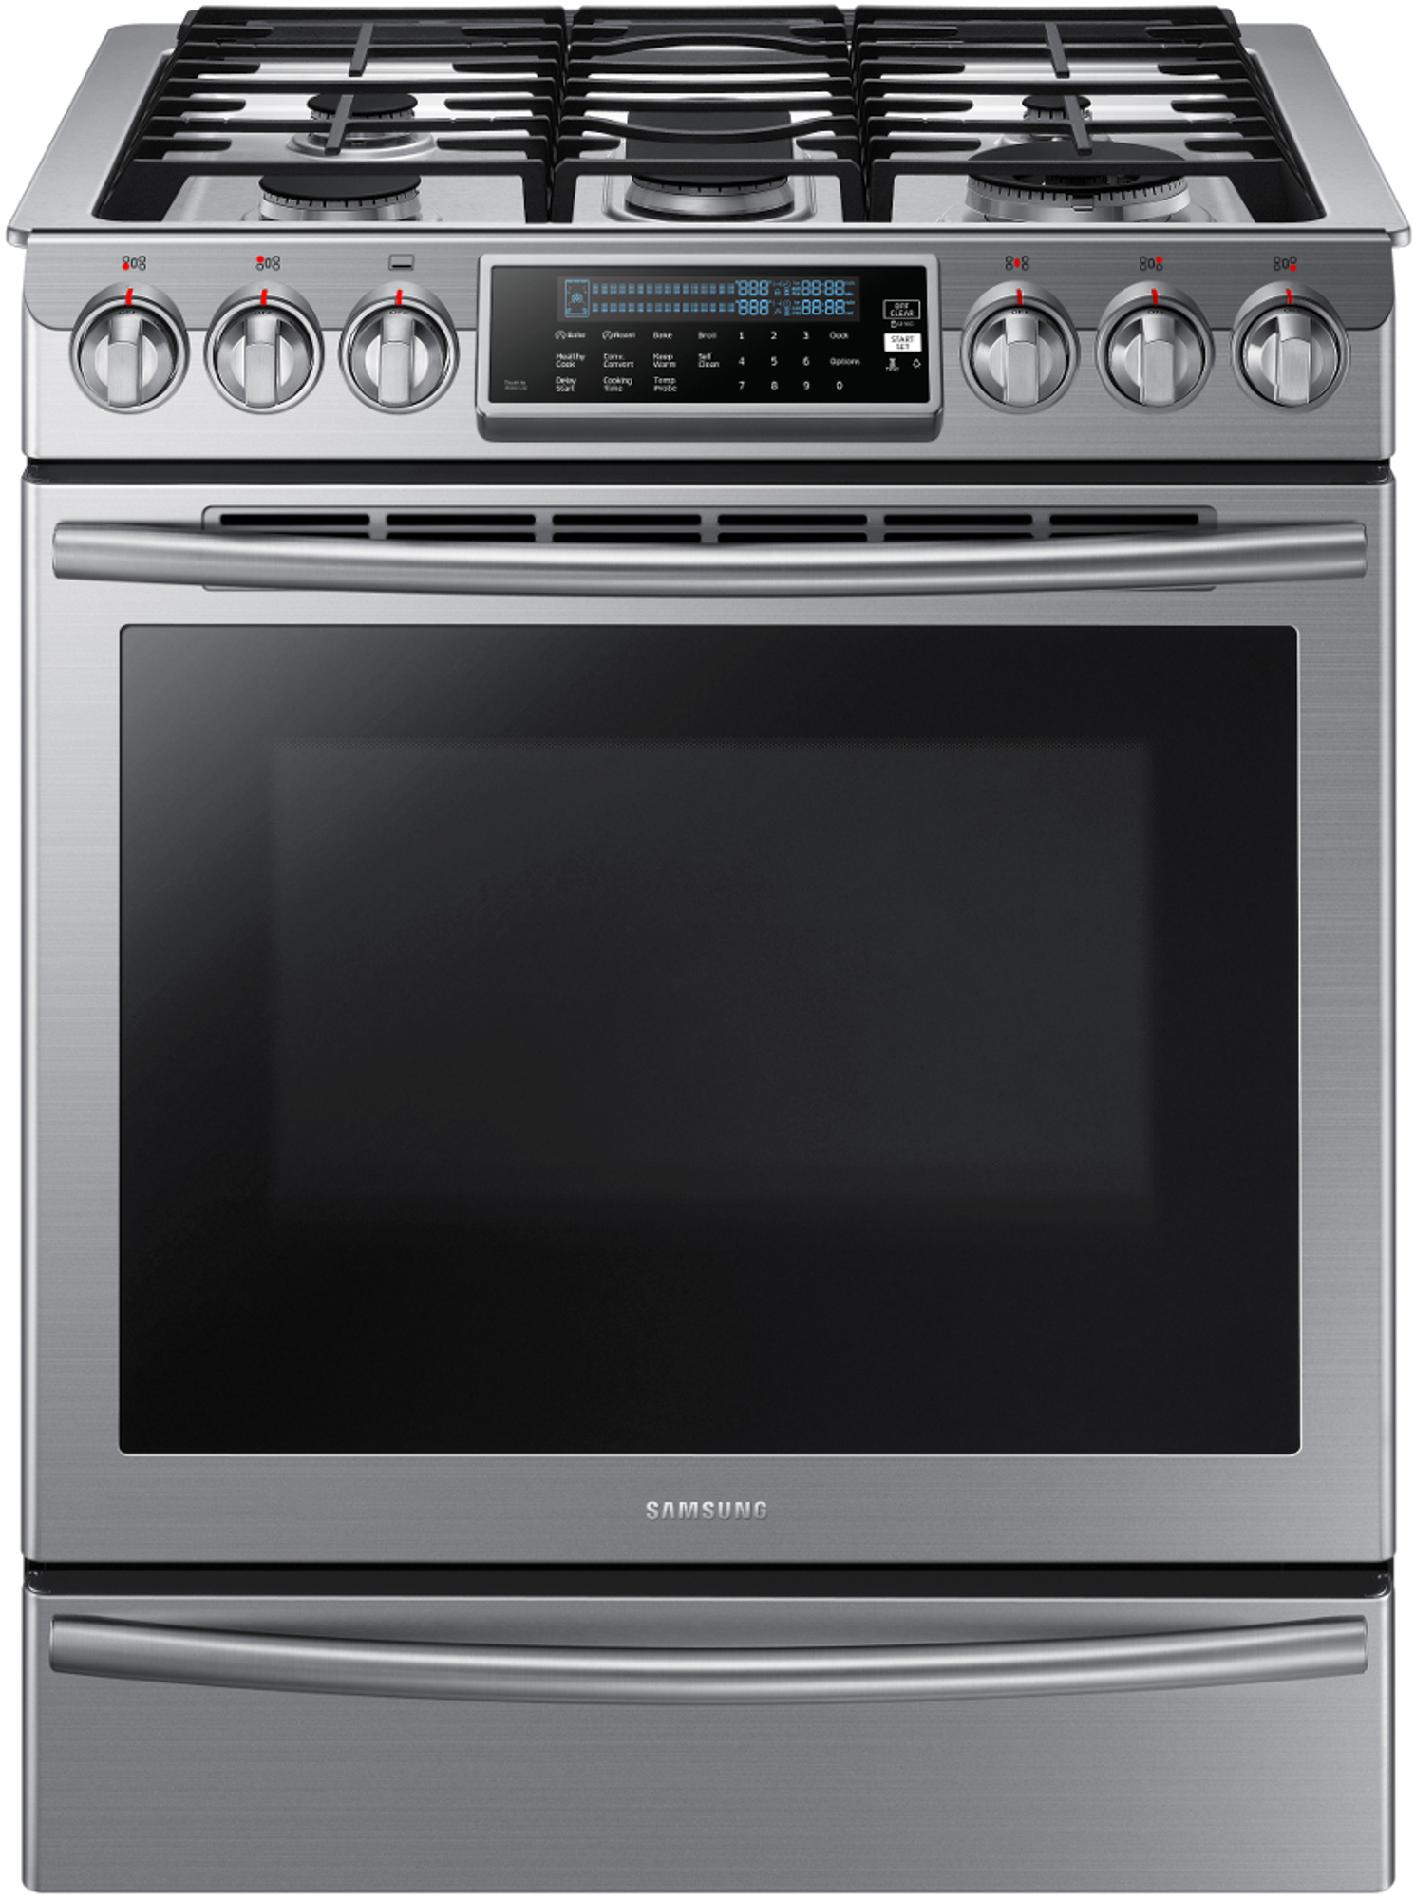 Nx58h9500ws Samsung